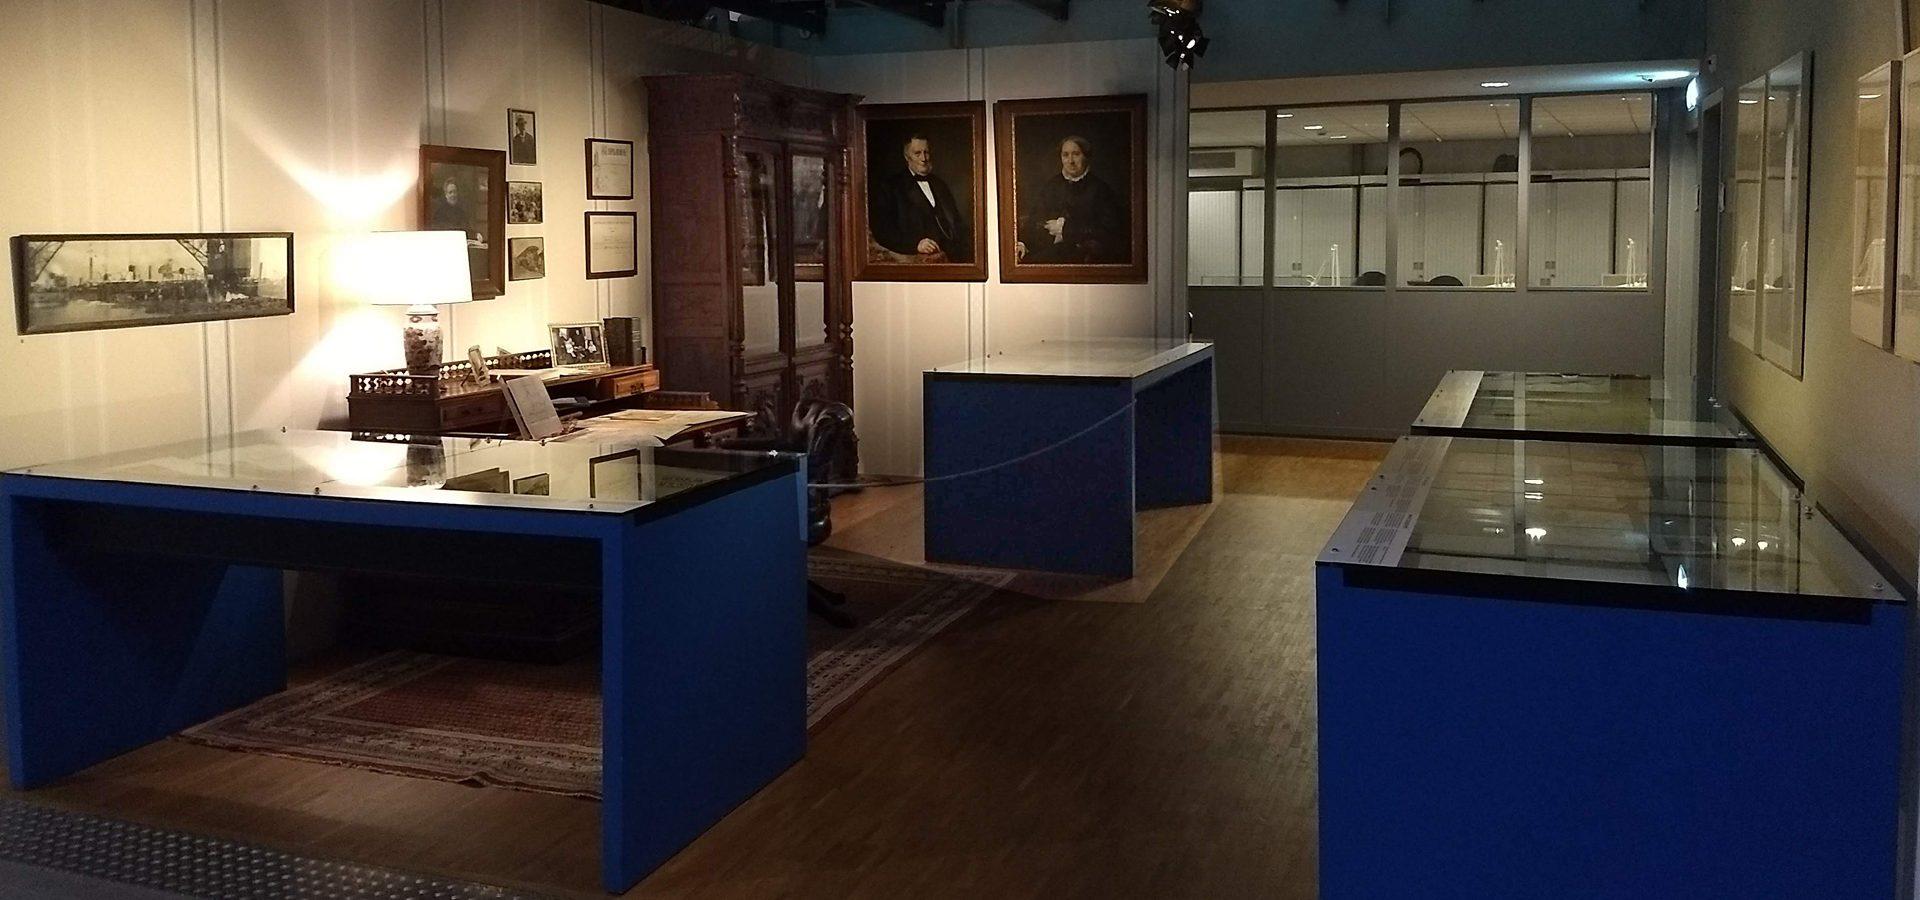 Johan Akkerman vormgeving musea Batavialand Lely